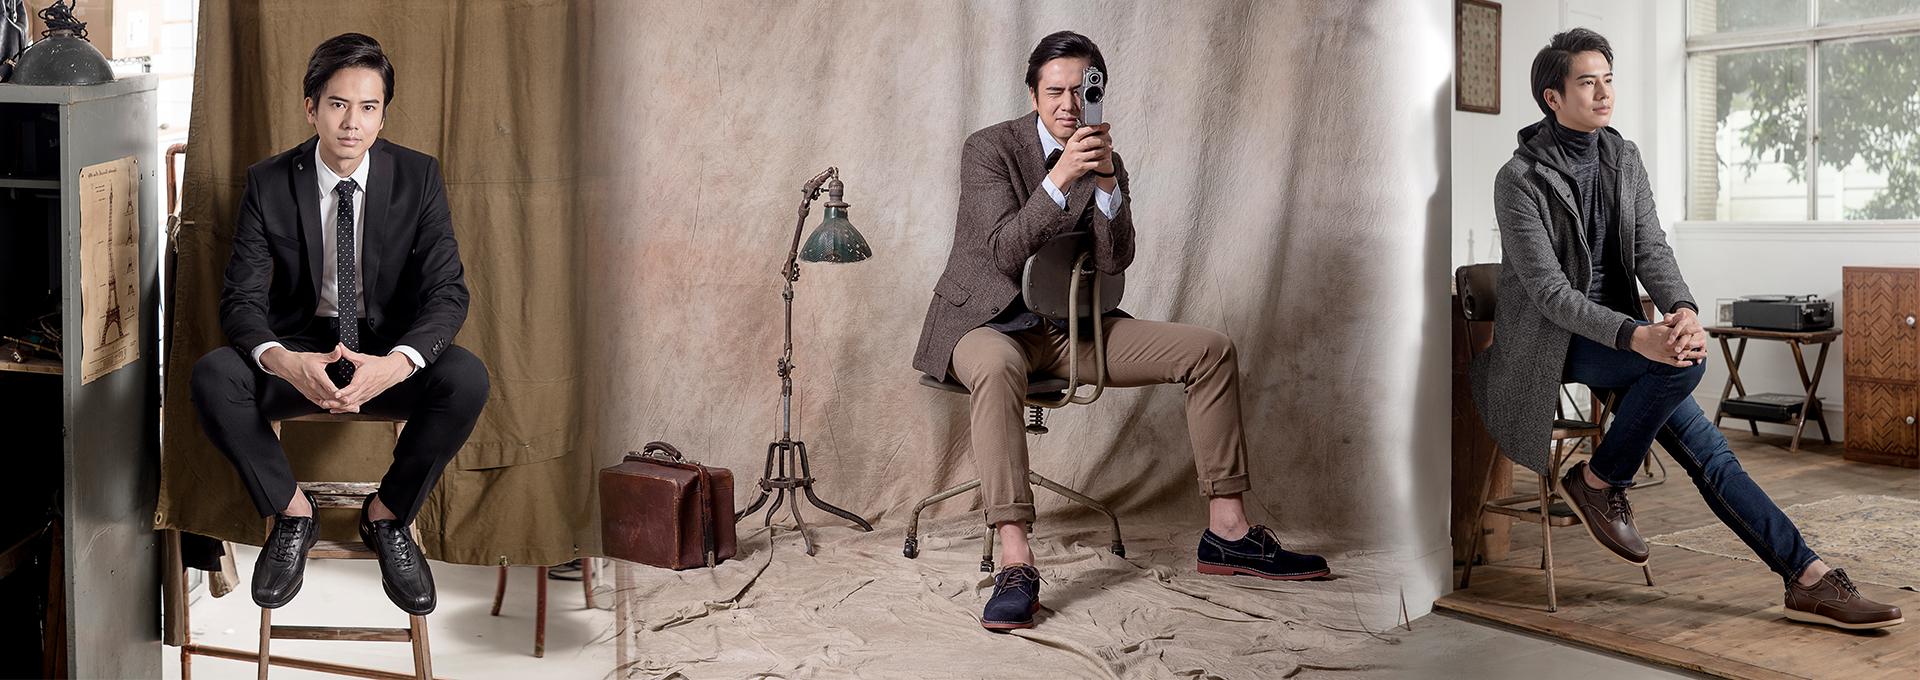 HAWKINS TRAVELLER 正裝新世代 : 紳士品格從日常做起